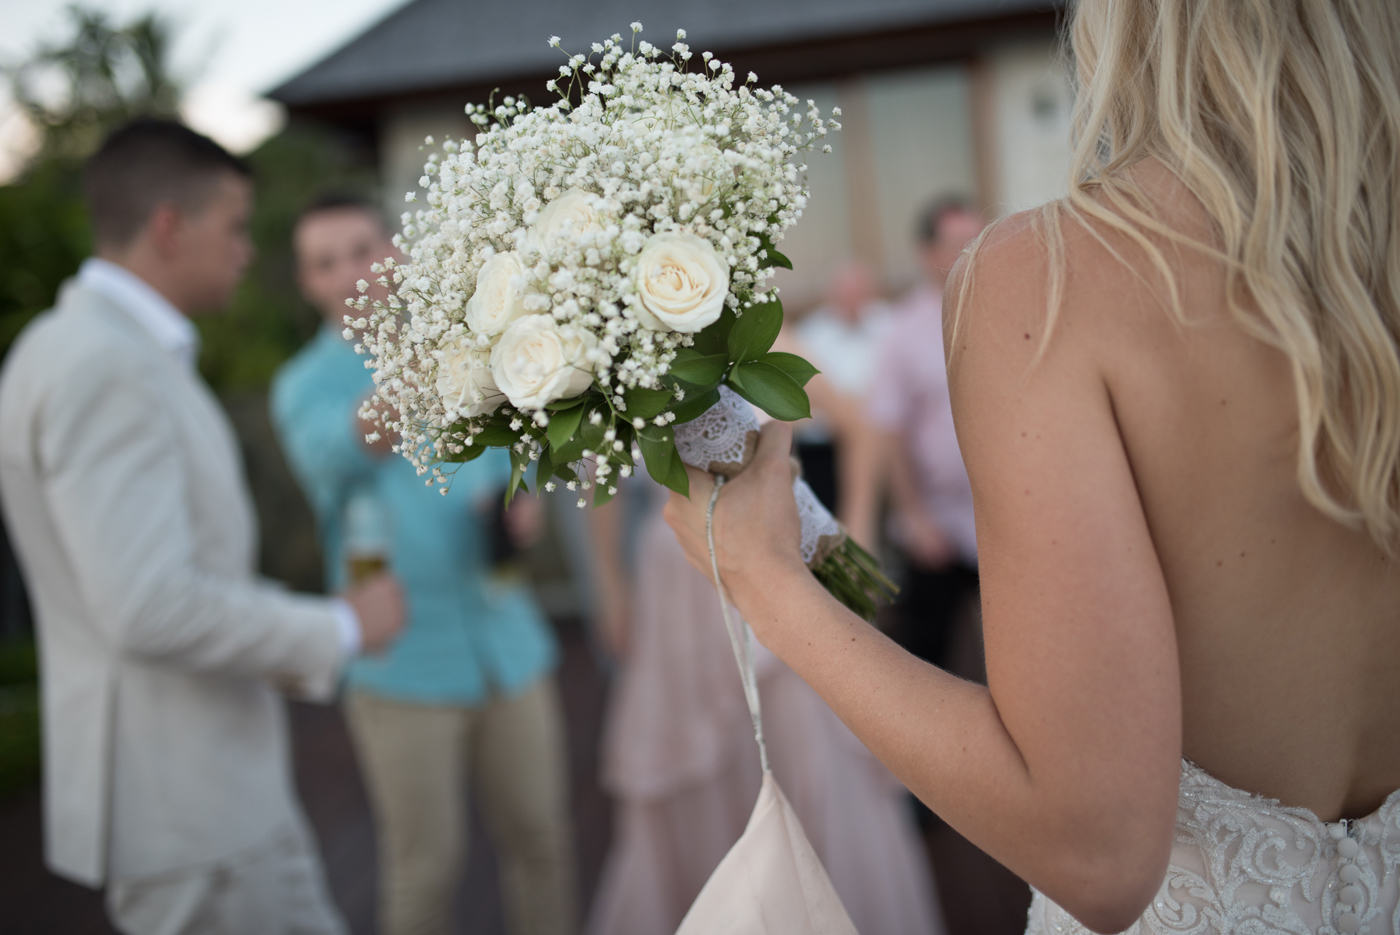 RC Real Bride Melissa + Aidan | The Edge Bali Wedding | Overseas Wedding | Hadley by Sottero and Midgley